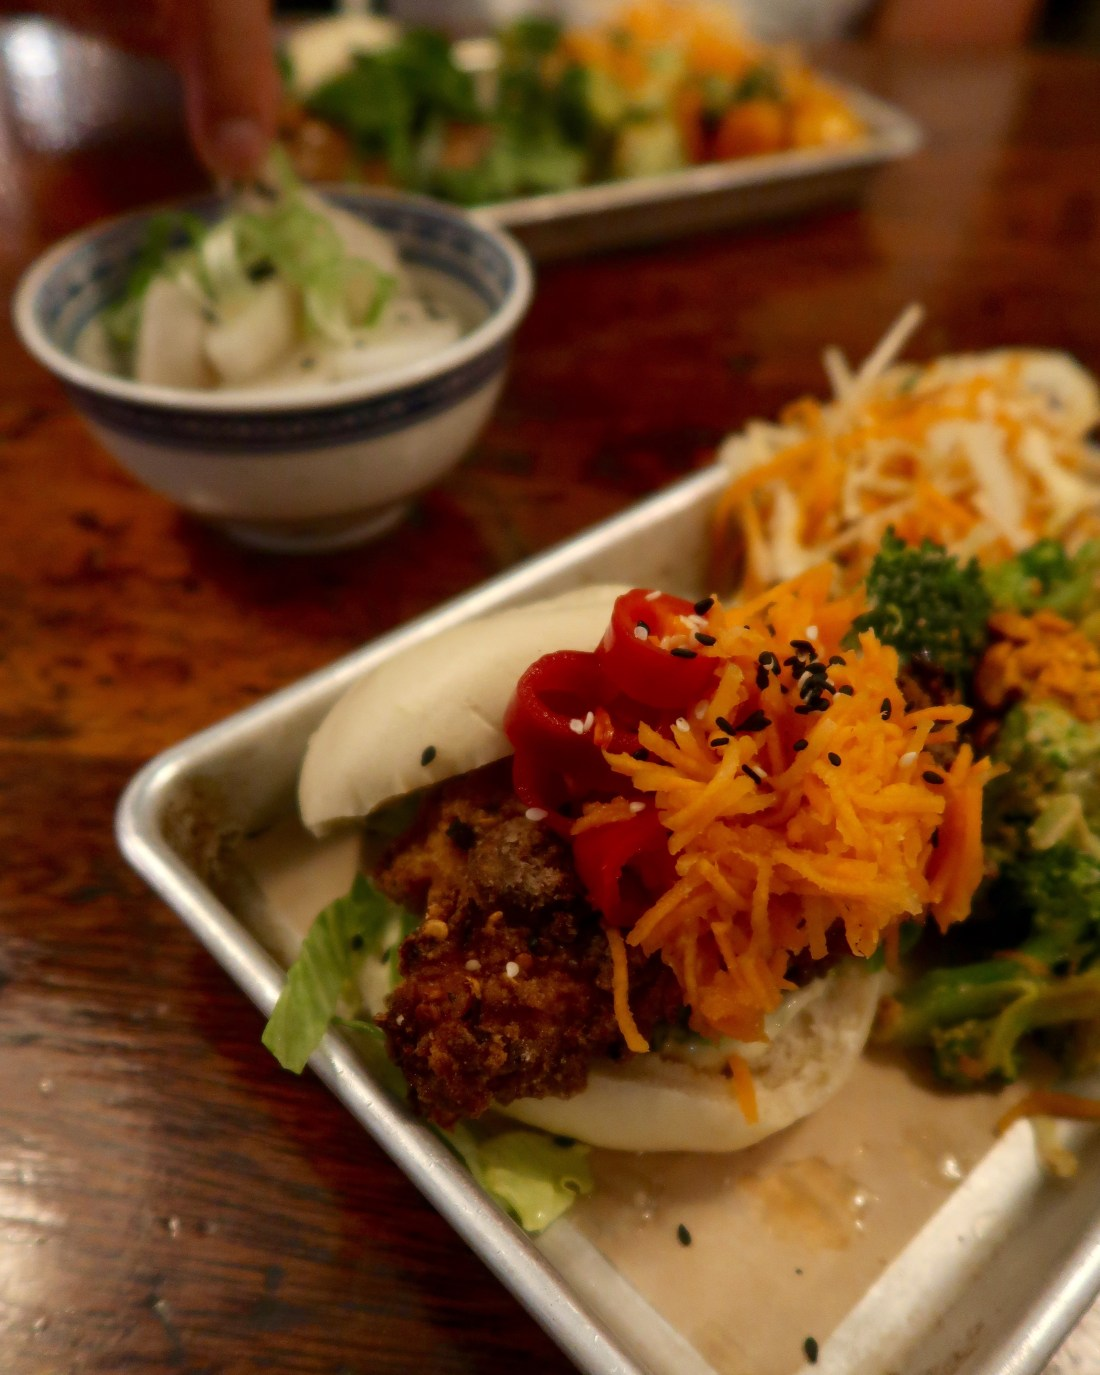 The Best Vegan Friendly Restaurants in Manchester, Baohouse, Mackie Mayor, Nishi V